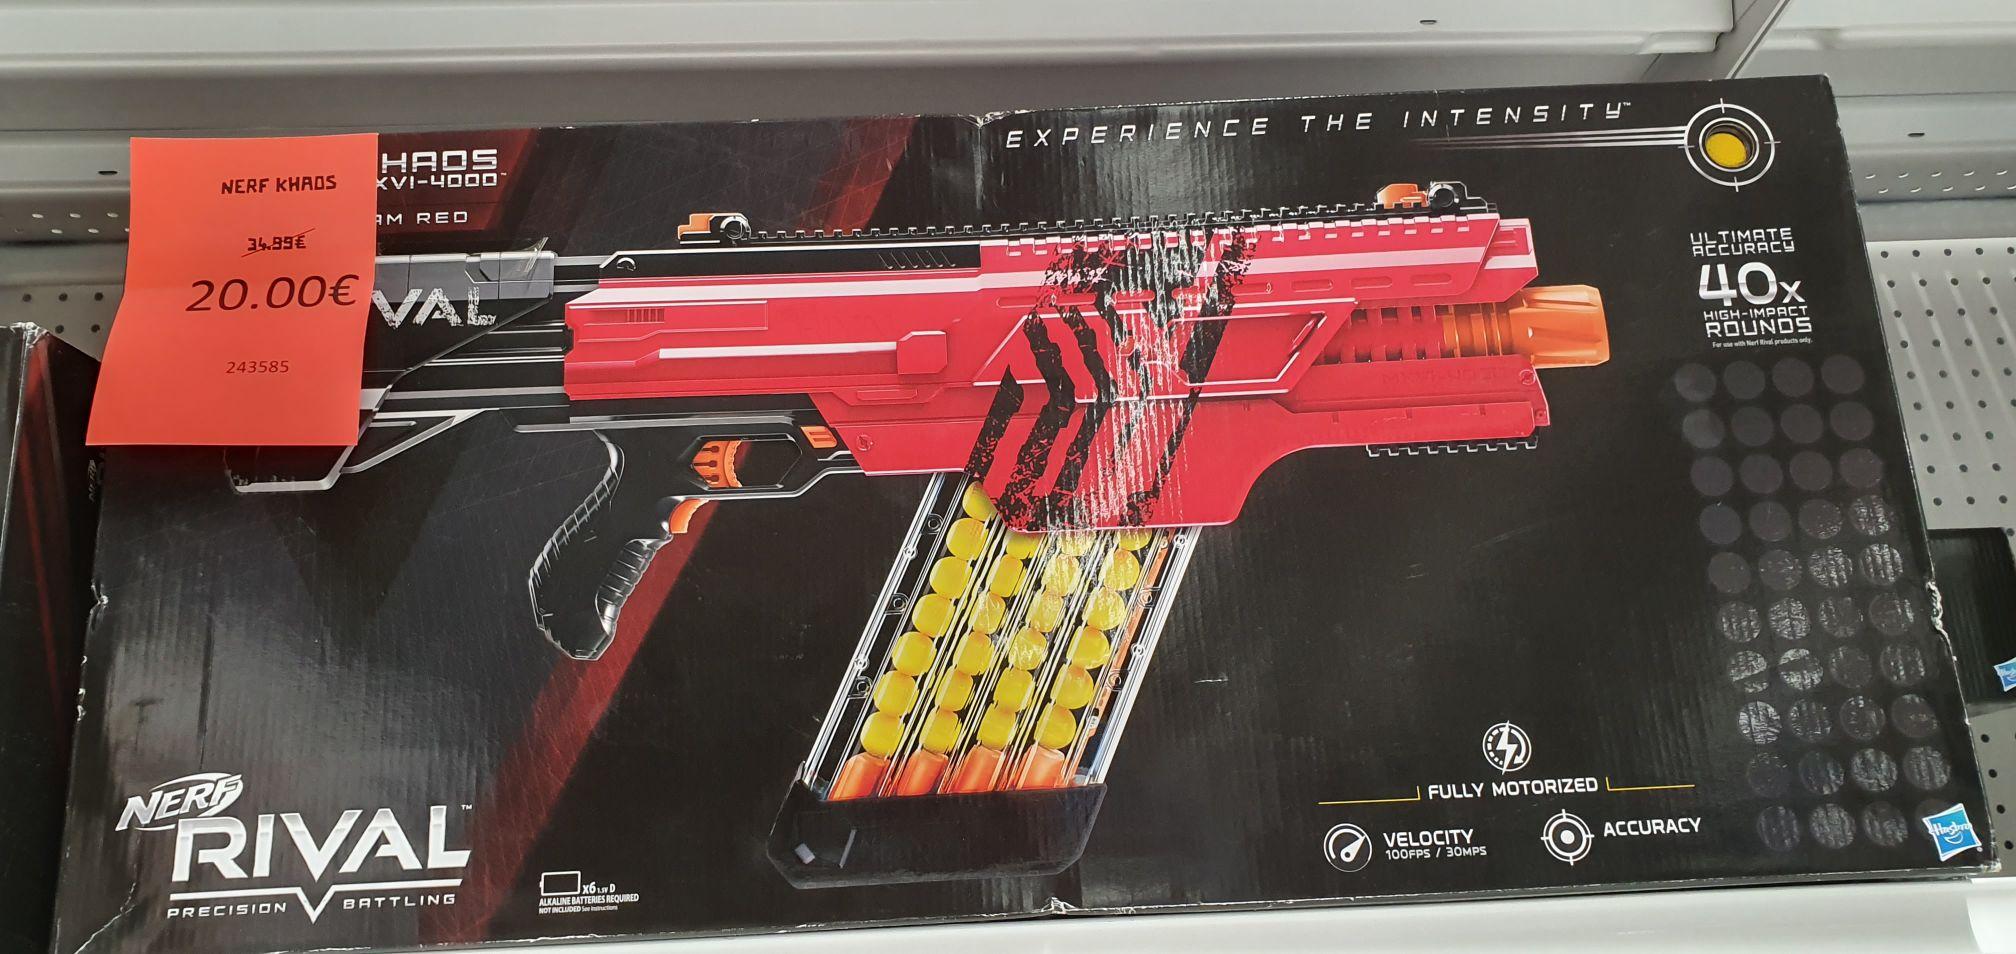 Pistolet Nerf Khaos - Livry-Gargan (93)